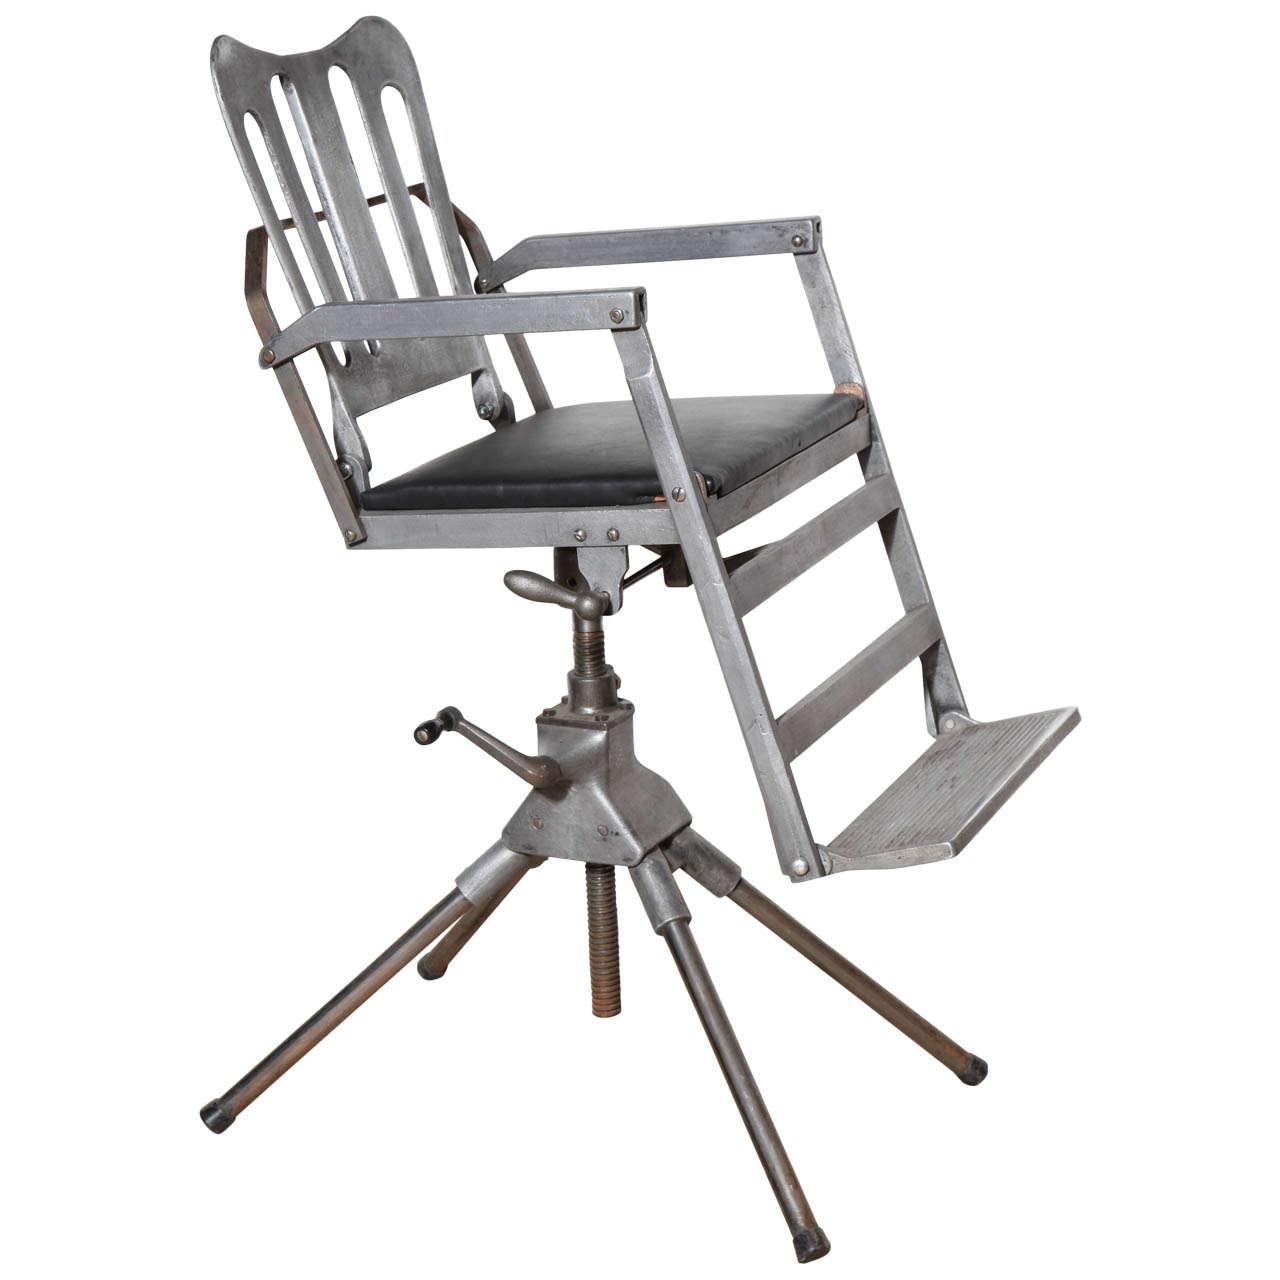 1920s Iron, Cast Aluminum And Leather Military Medical Chair U0027Recline U0026 Foldu0027  For